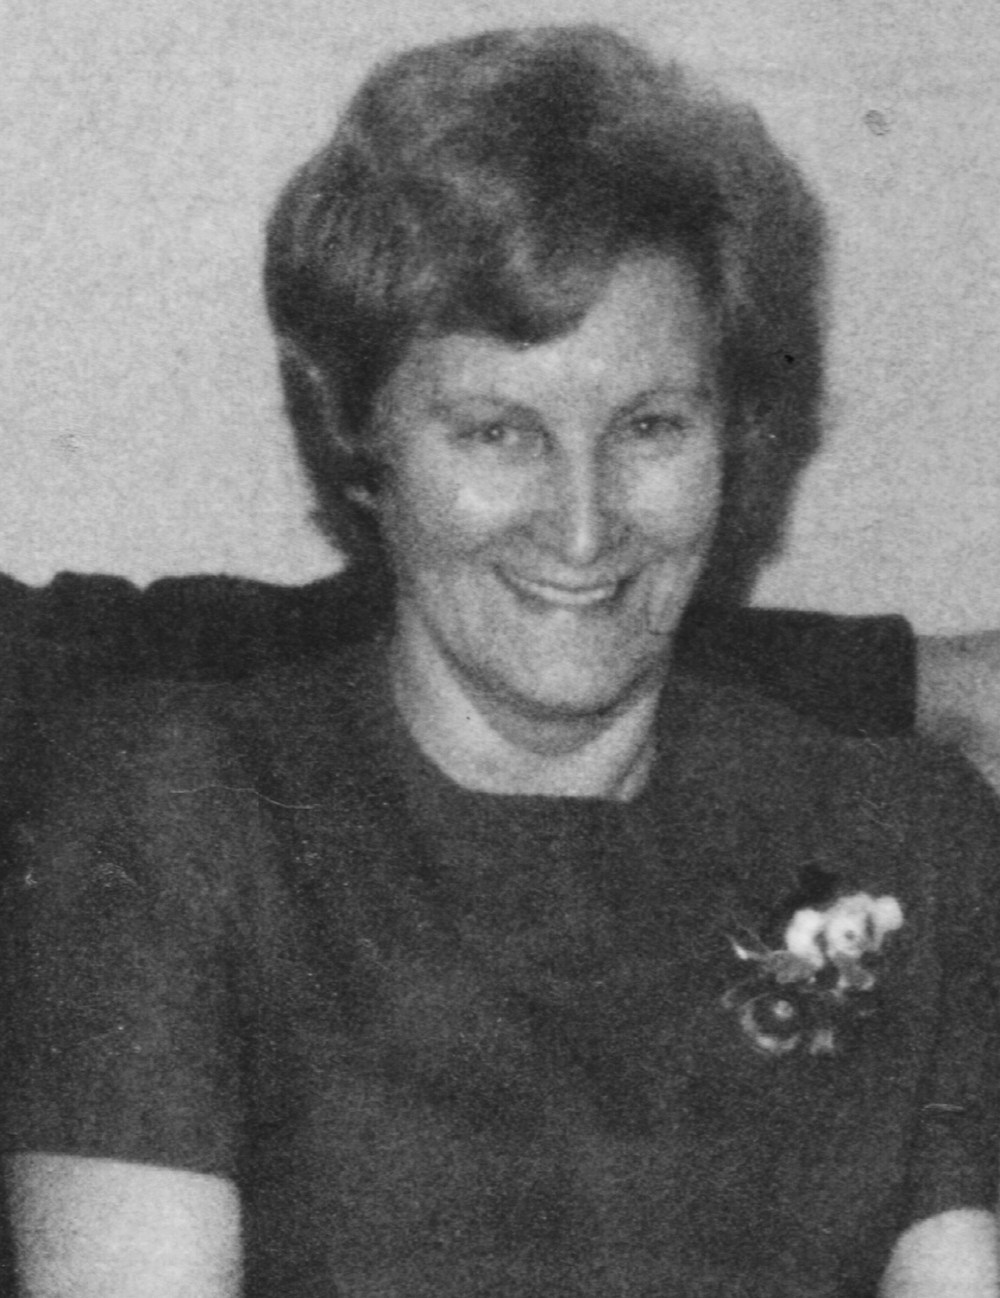 Communication on this topic: Ellen Foley, gladys-ambrose/